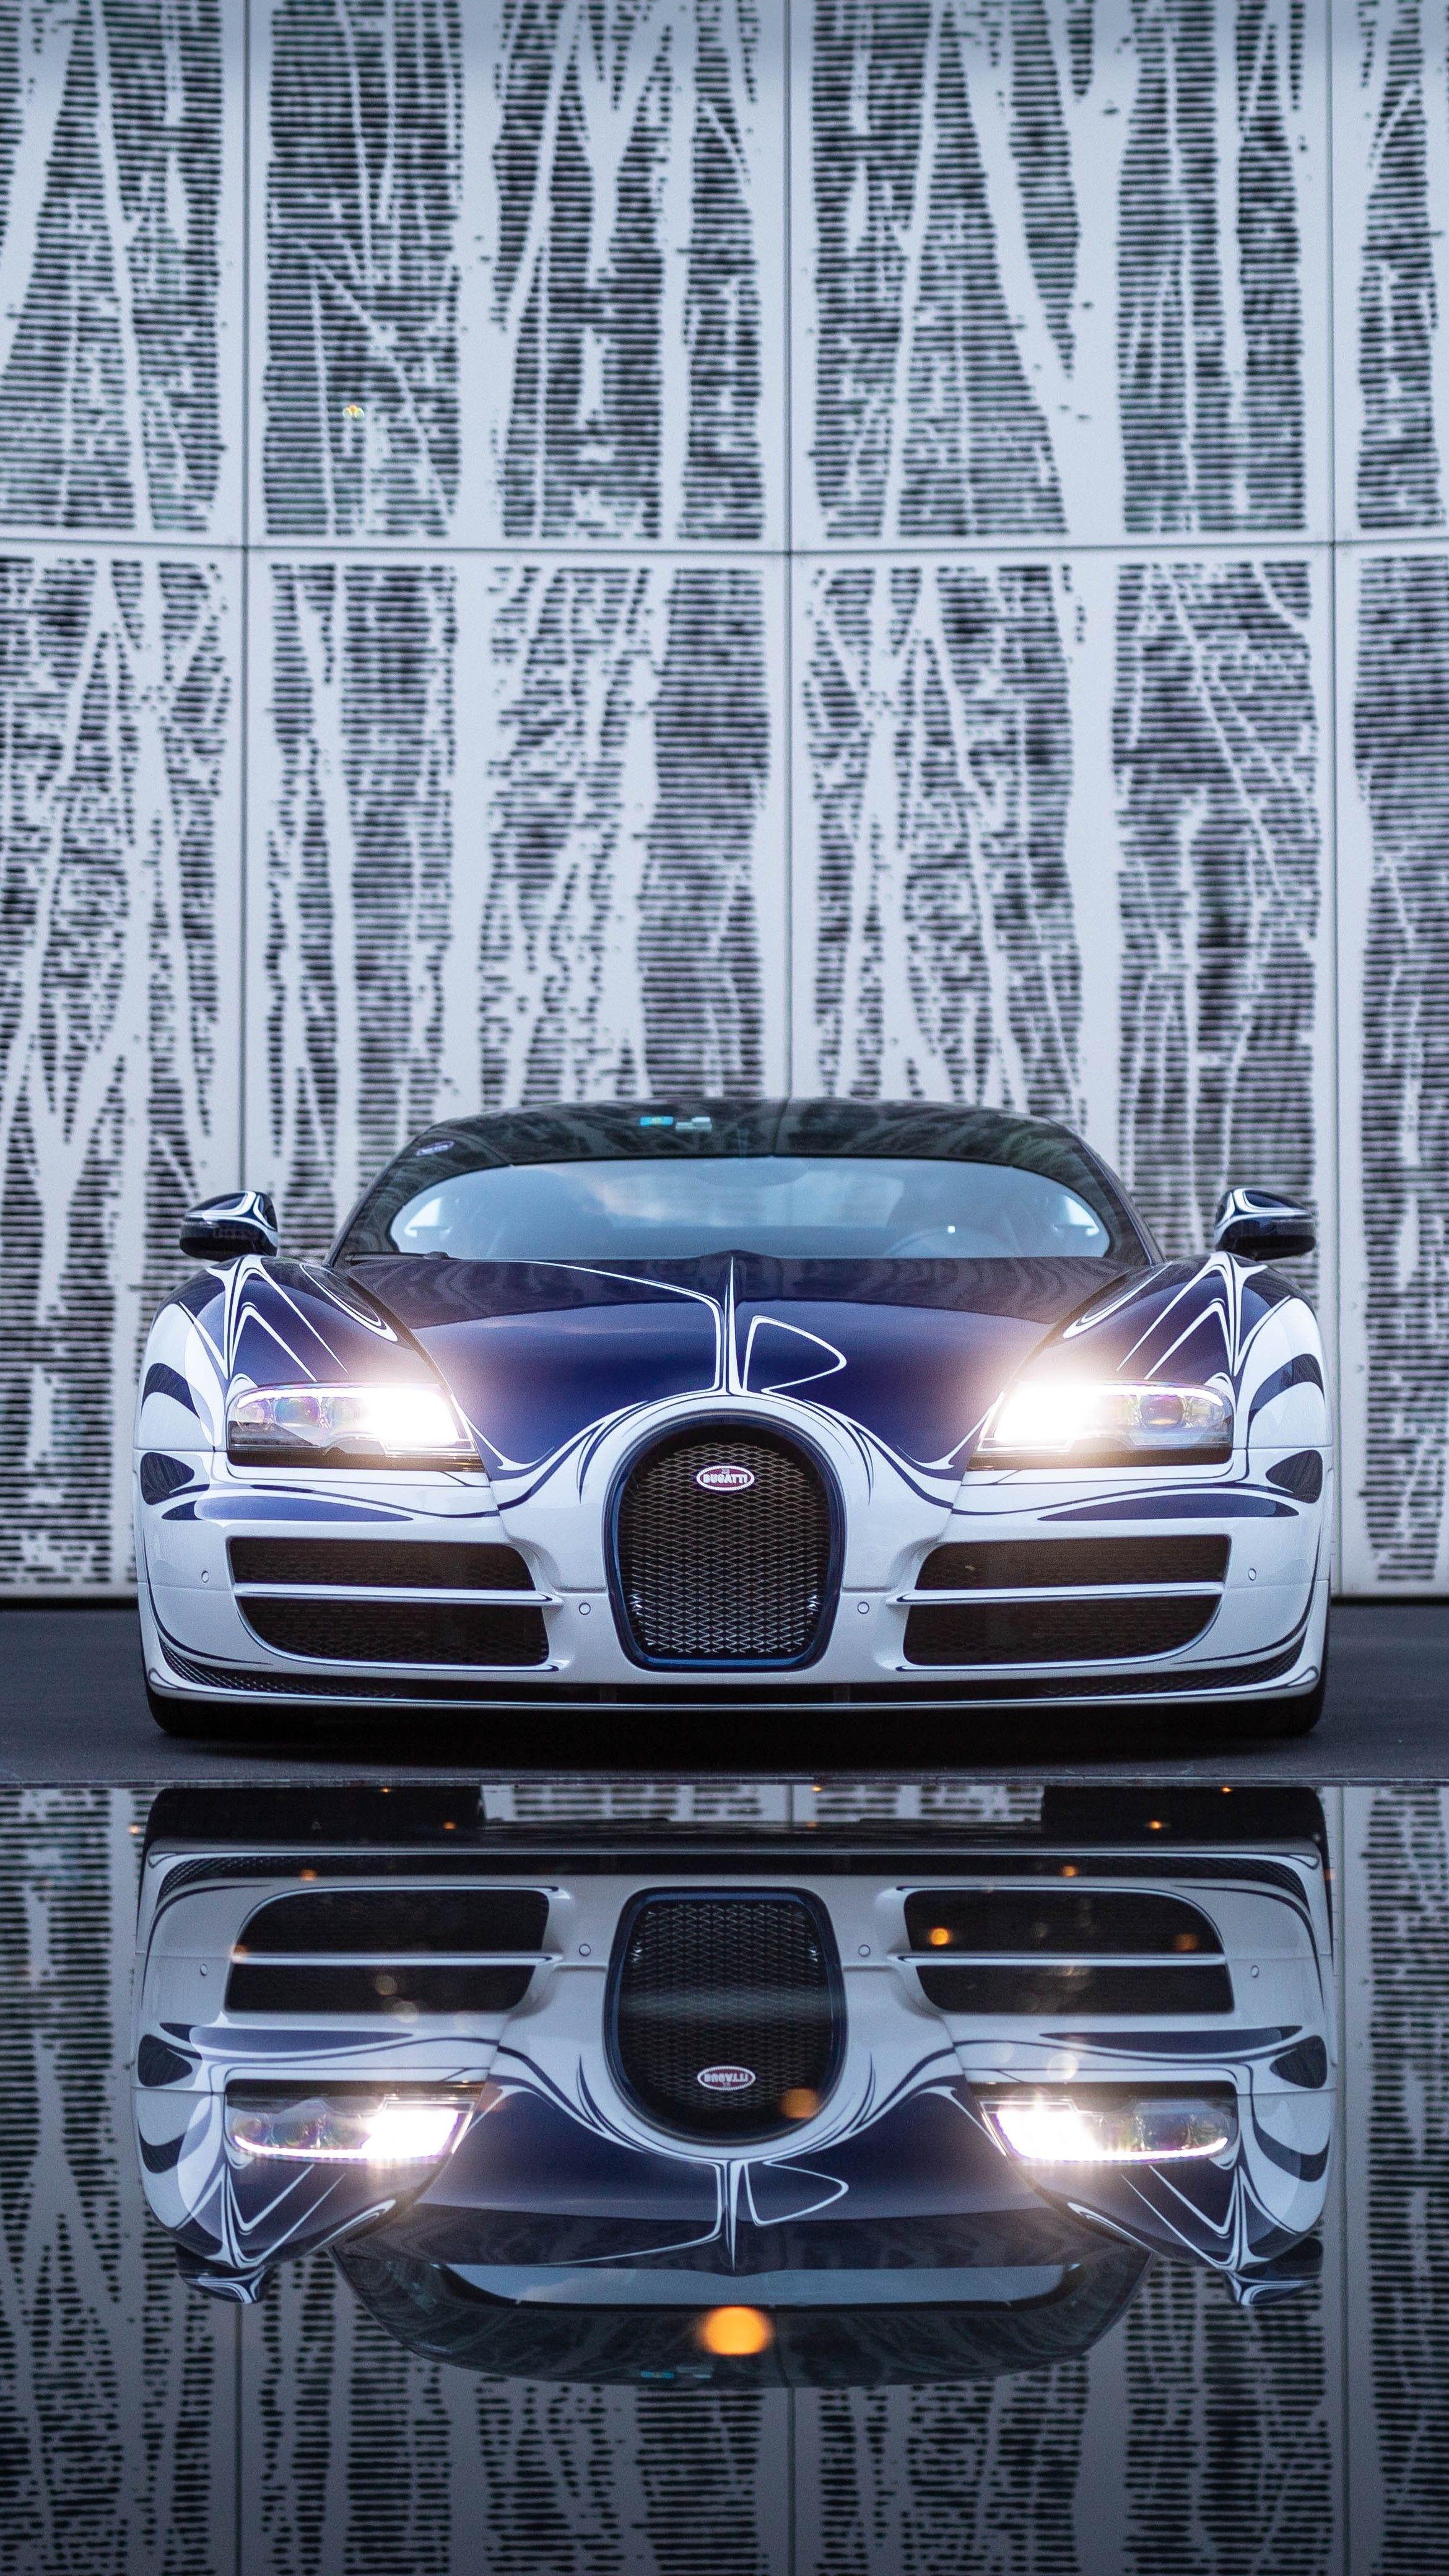 Bugatti Veyron Grand Sport Vitesse 001 2013 Bugatti Wallpapers Bugatti Veyron Grand Sport Vitesse Bugatti Chiron